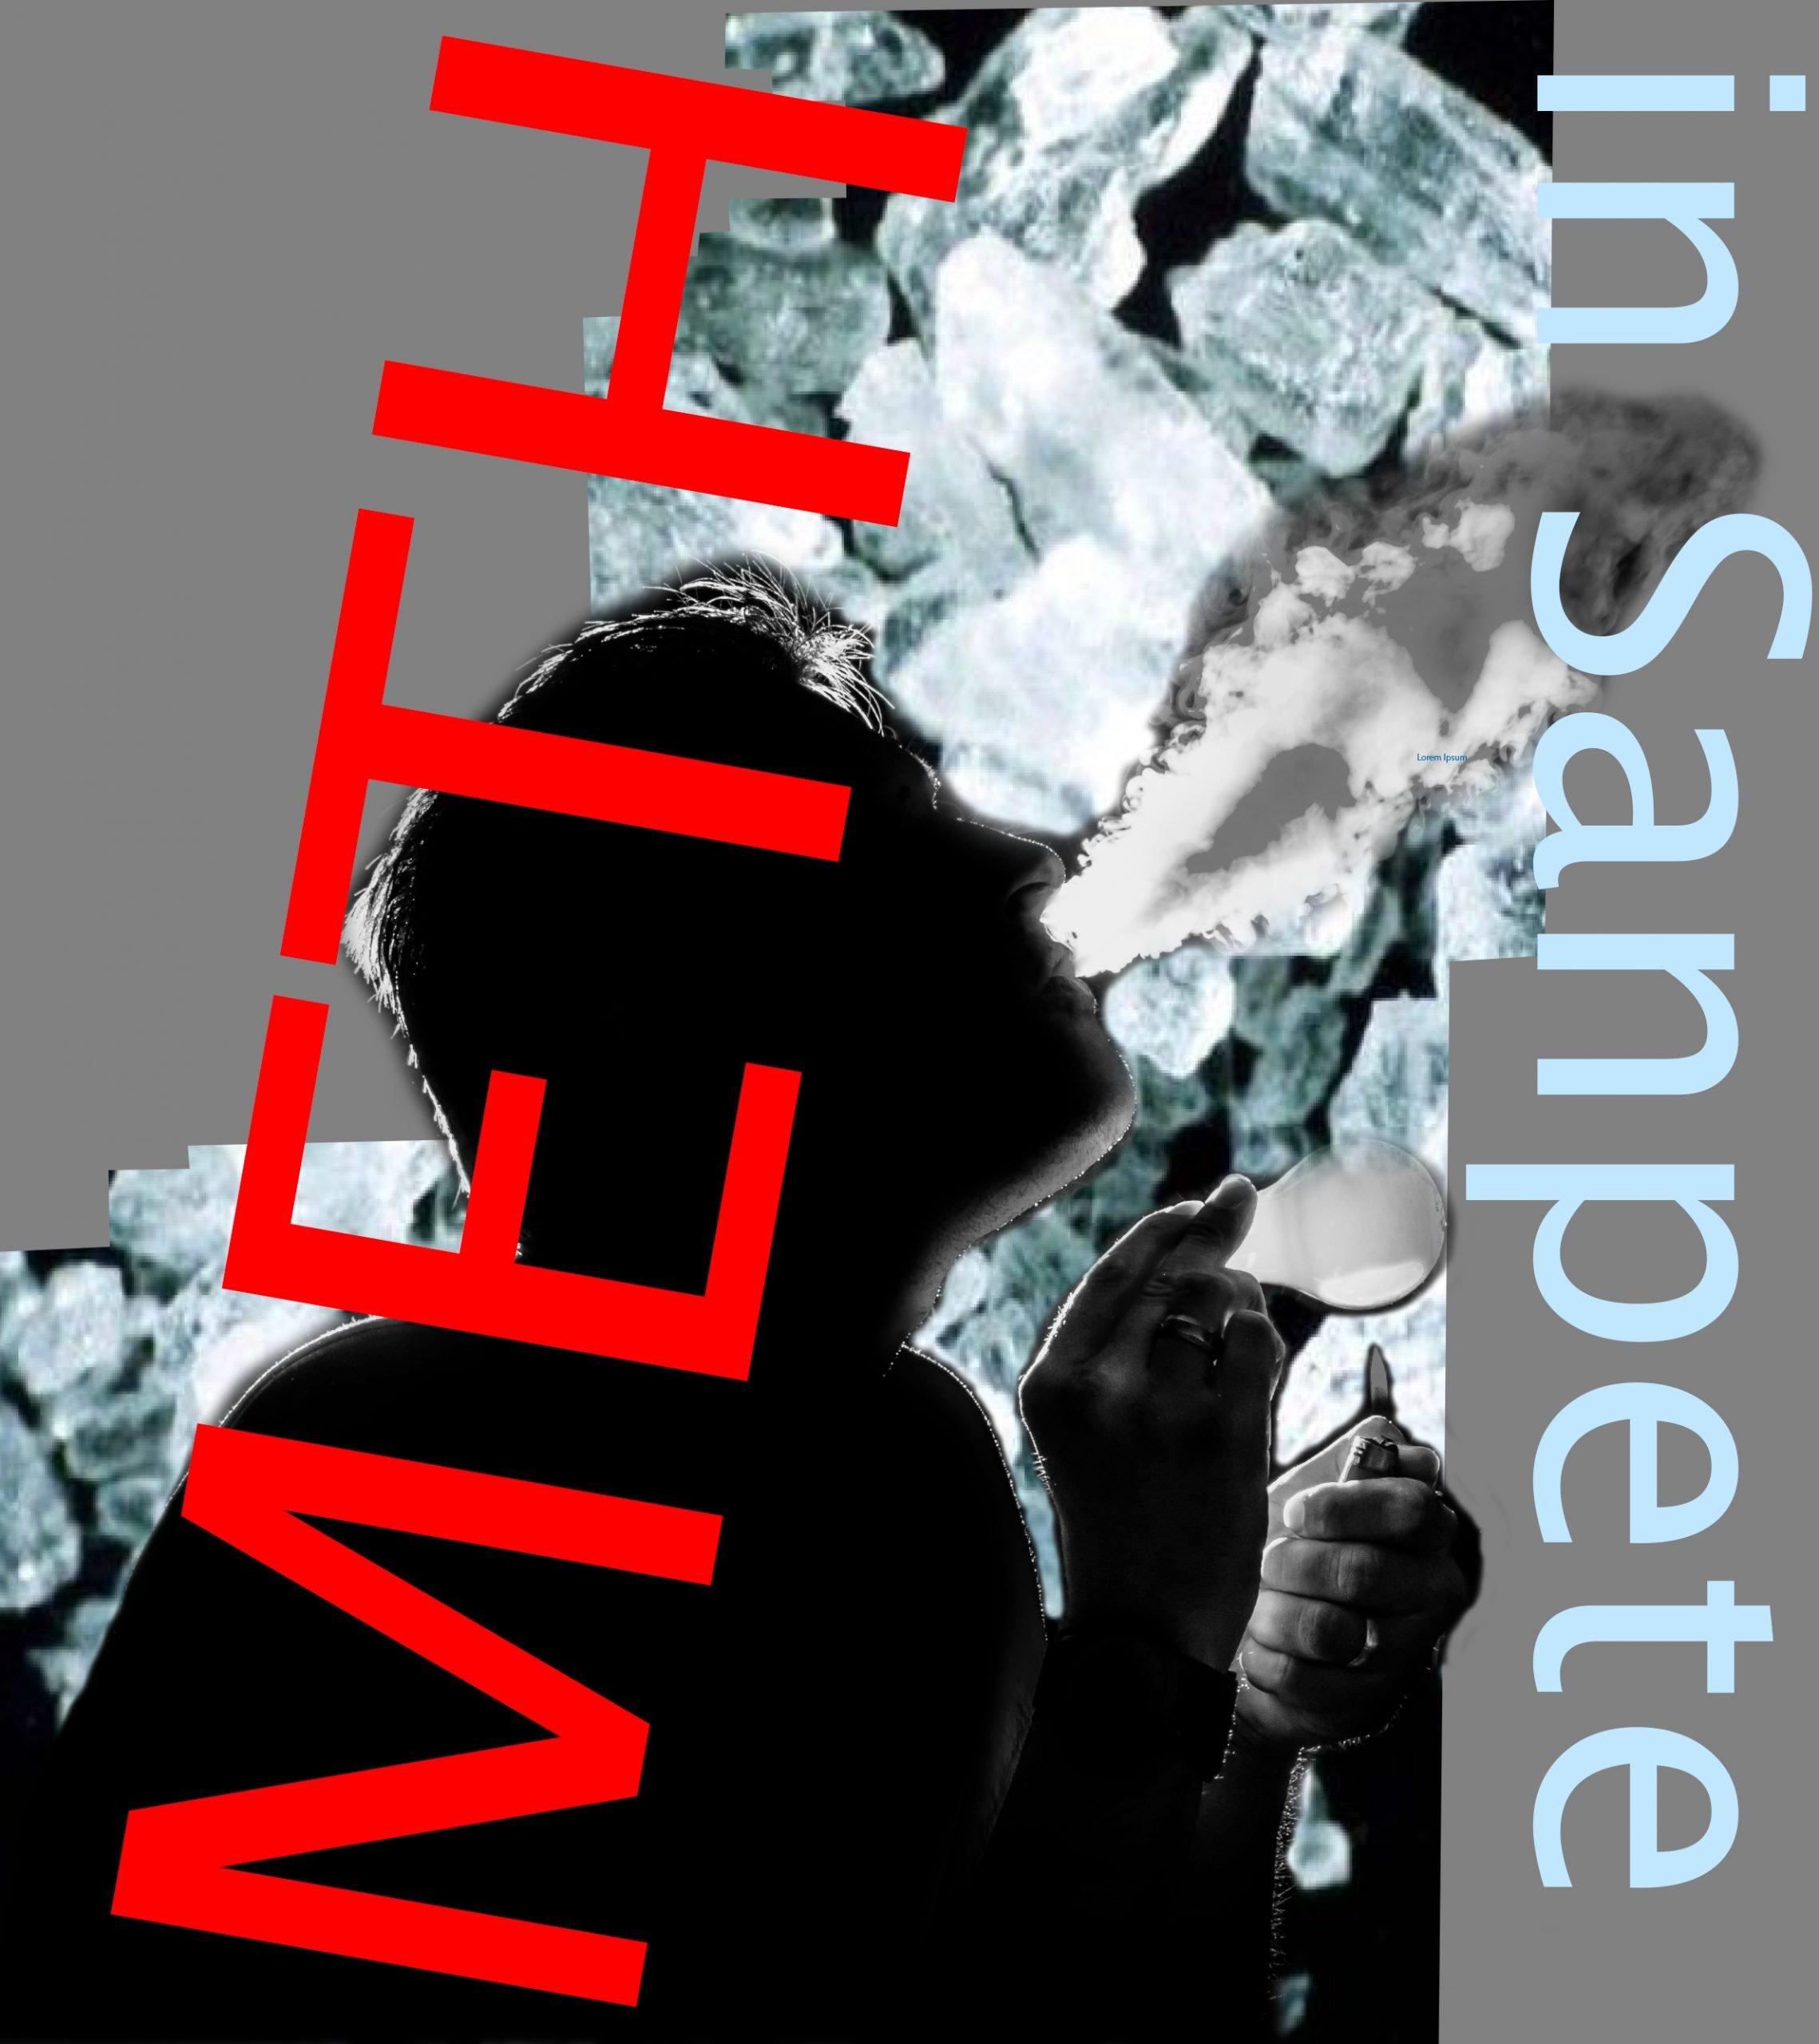 Meth Logo image